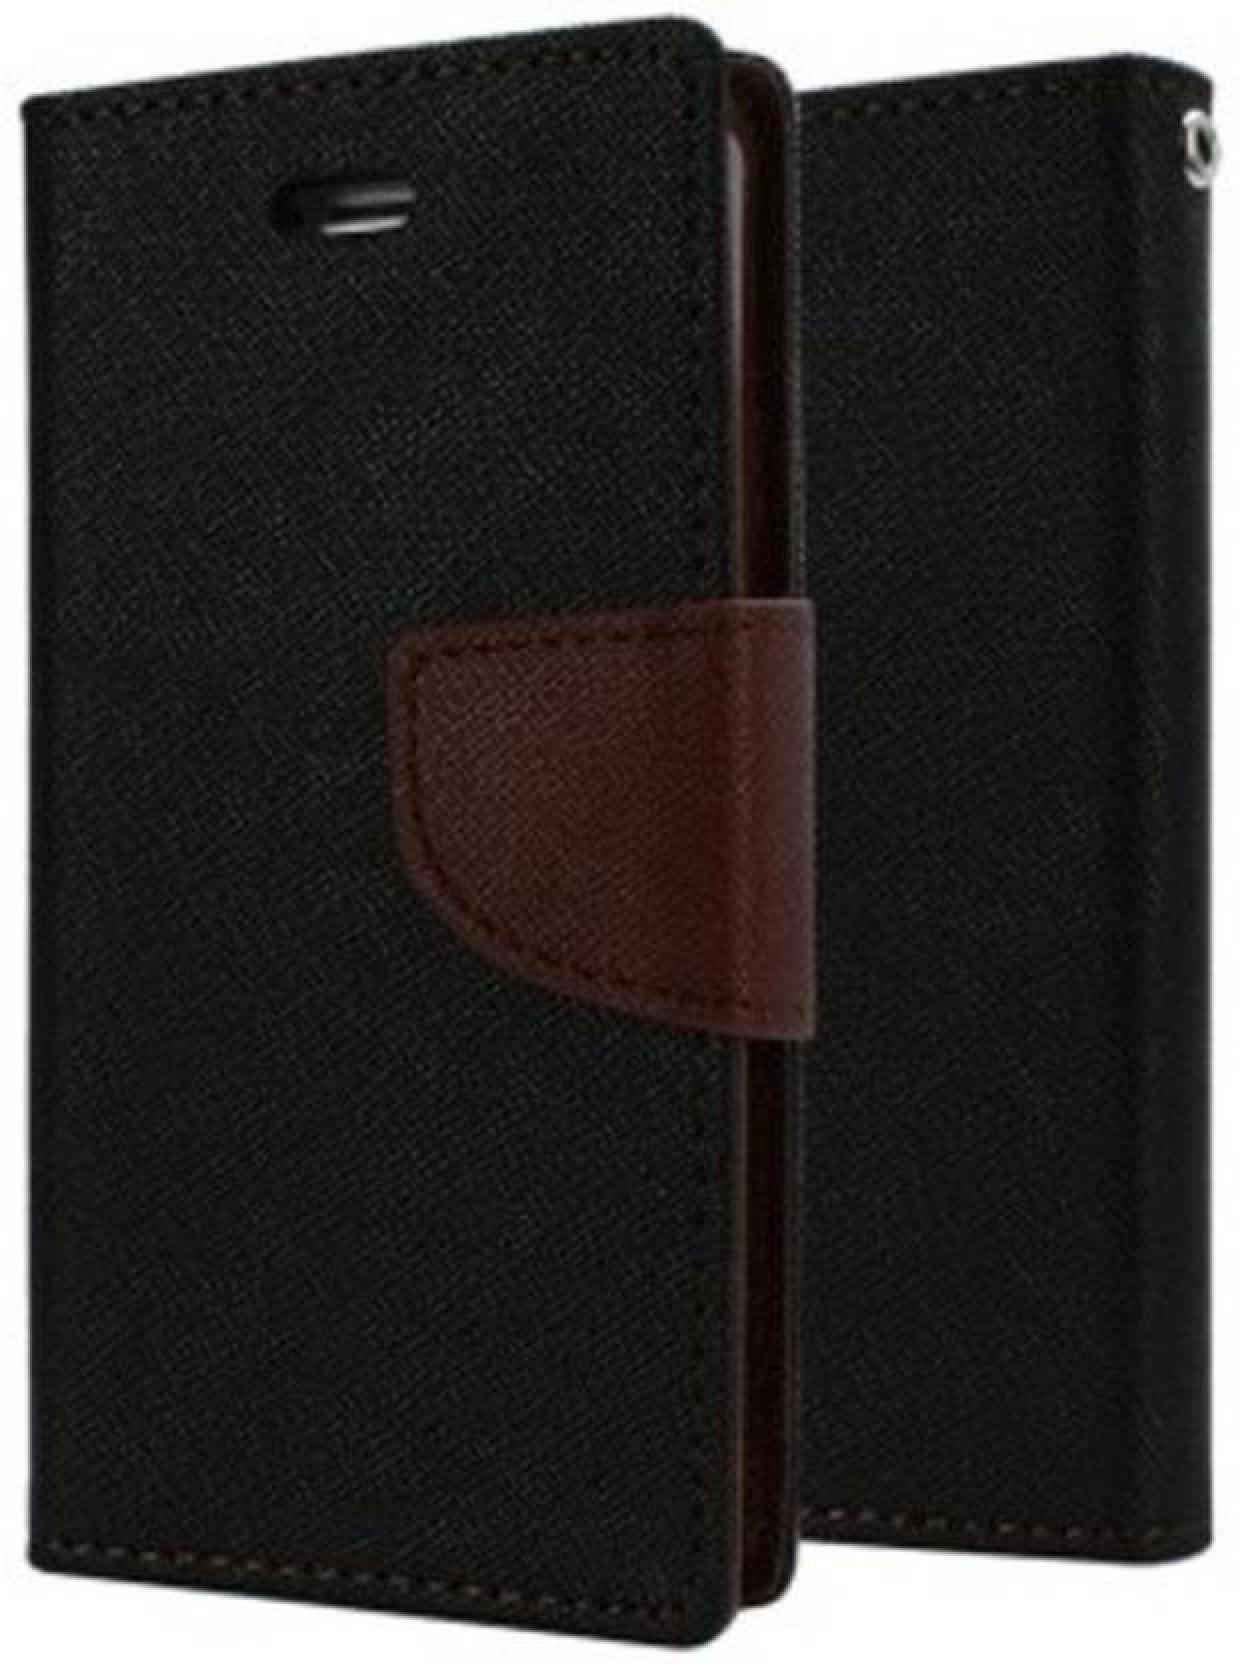 newest 443f9 33ffe mCase Flip Cover for Samsung Galaxy J2 Pro 2018 - mCase : Flipkart.com